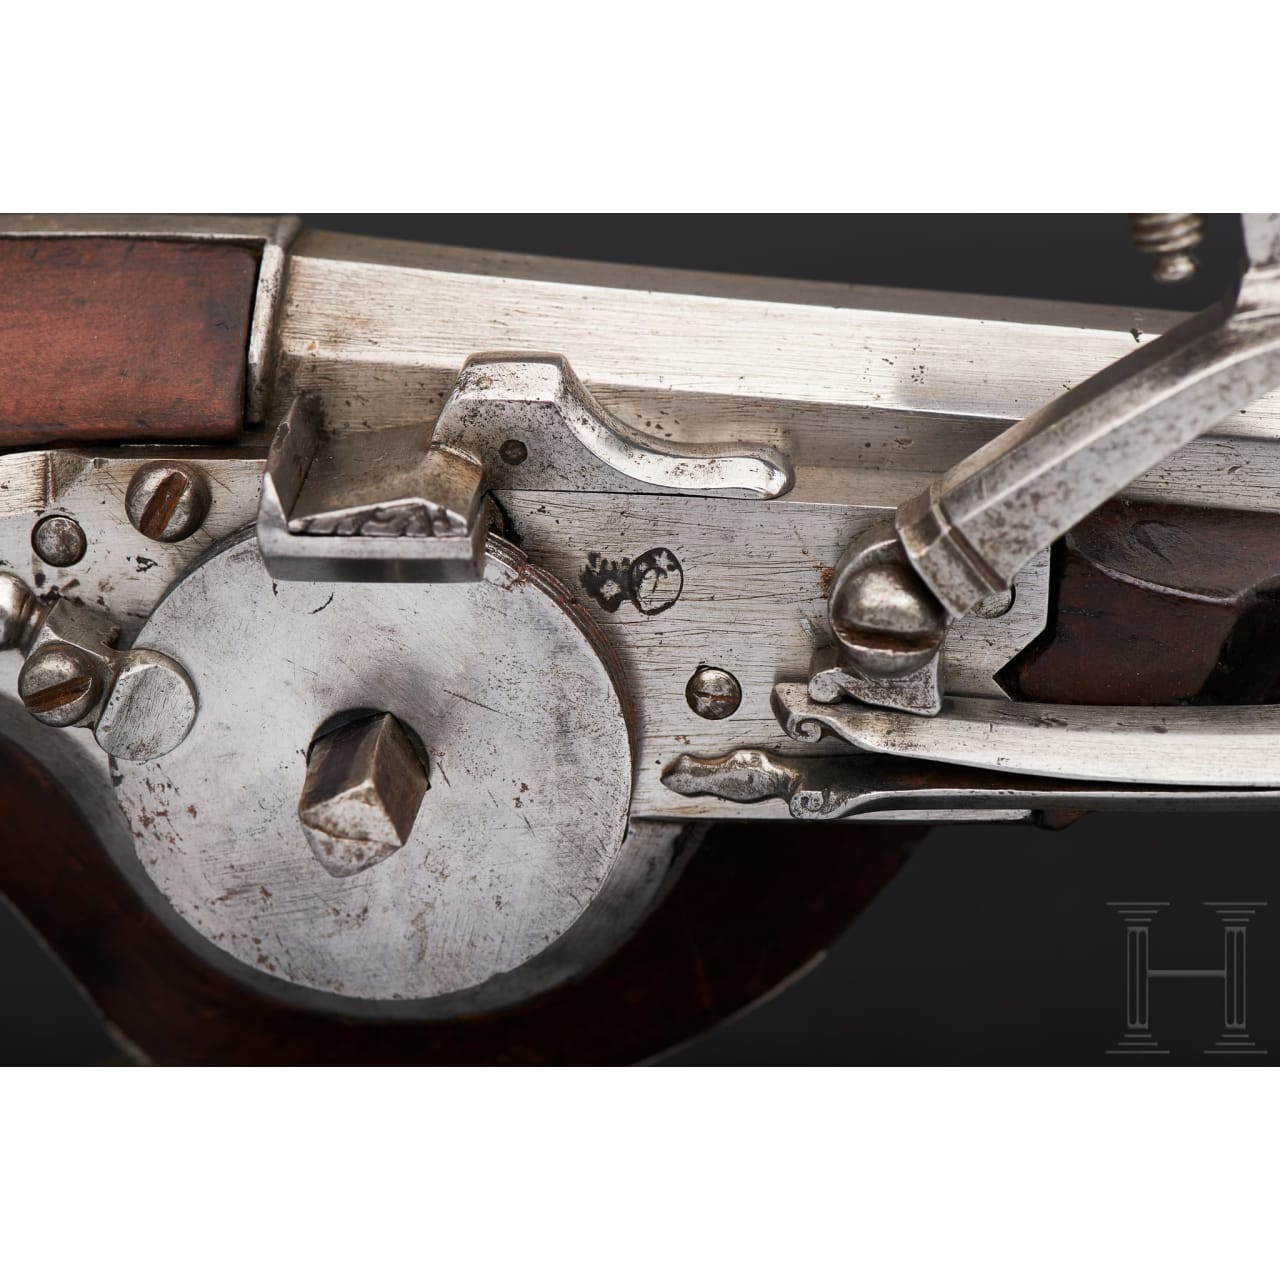 A French military wheellock pistol, circa 1630